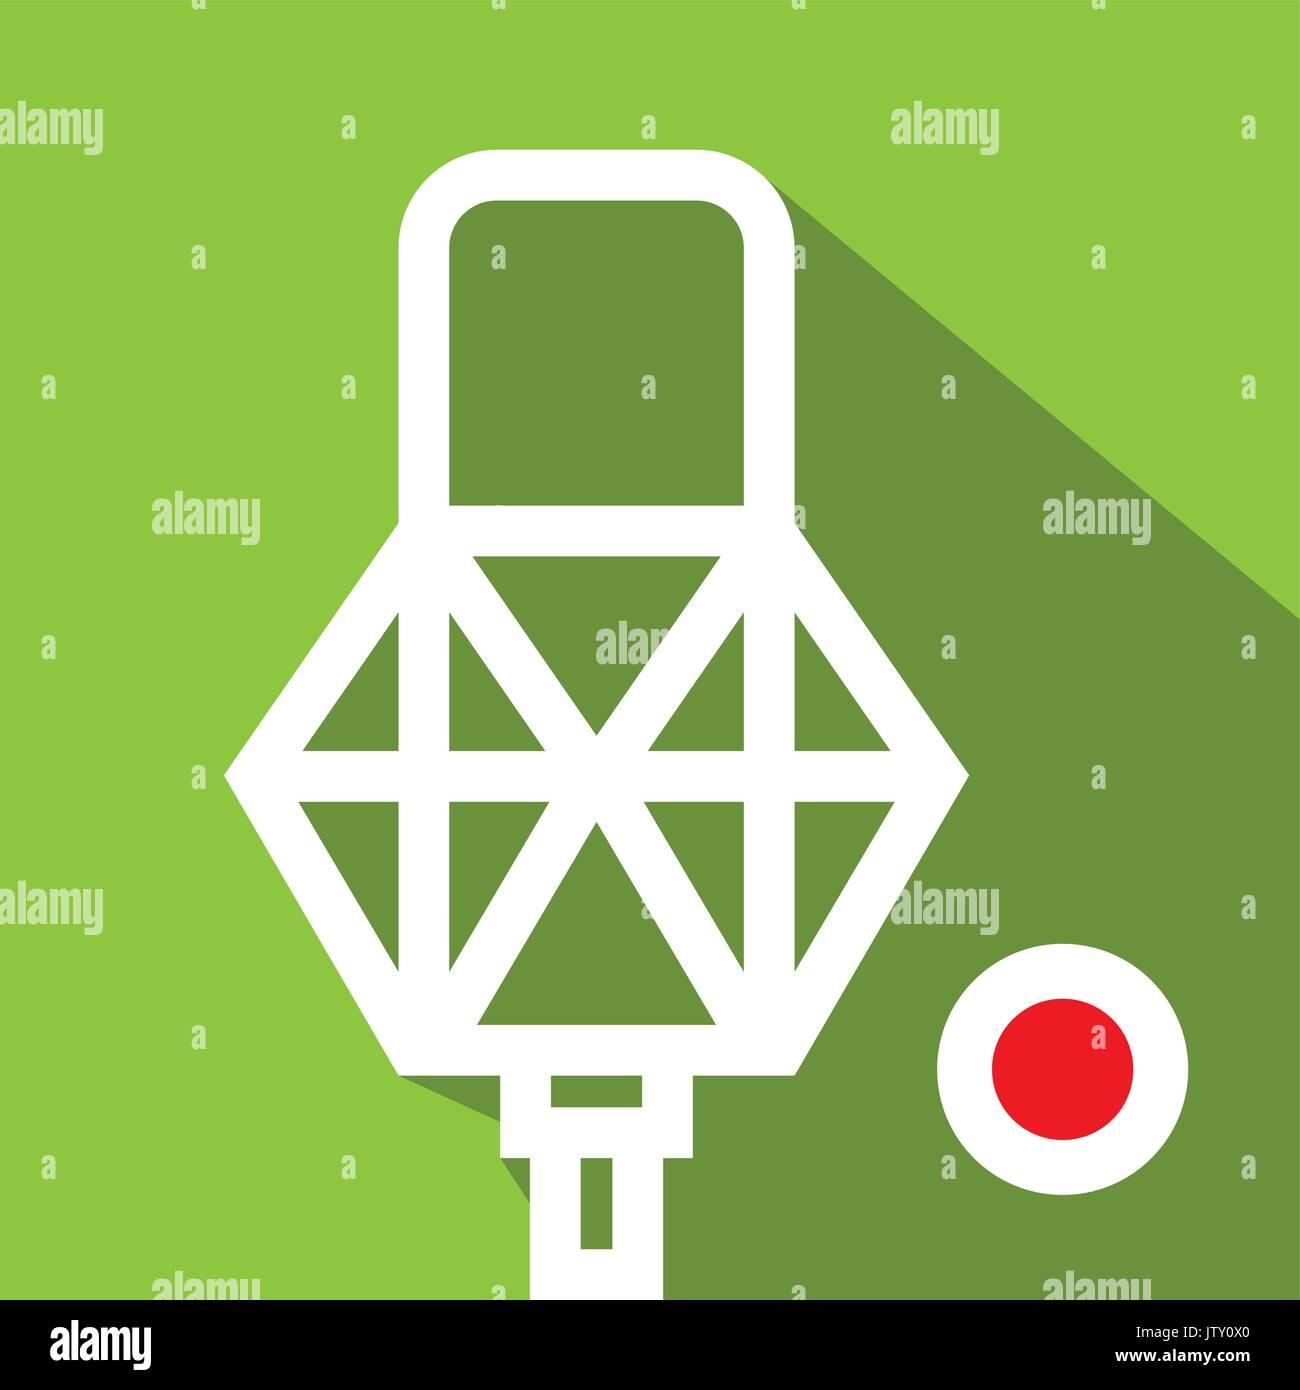 Recording icon. Sound and music icon. Flat design. Vector illustration. - Stock Image